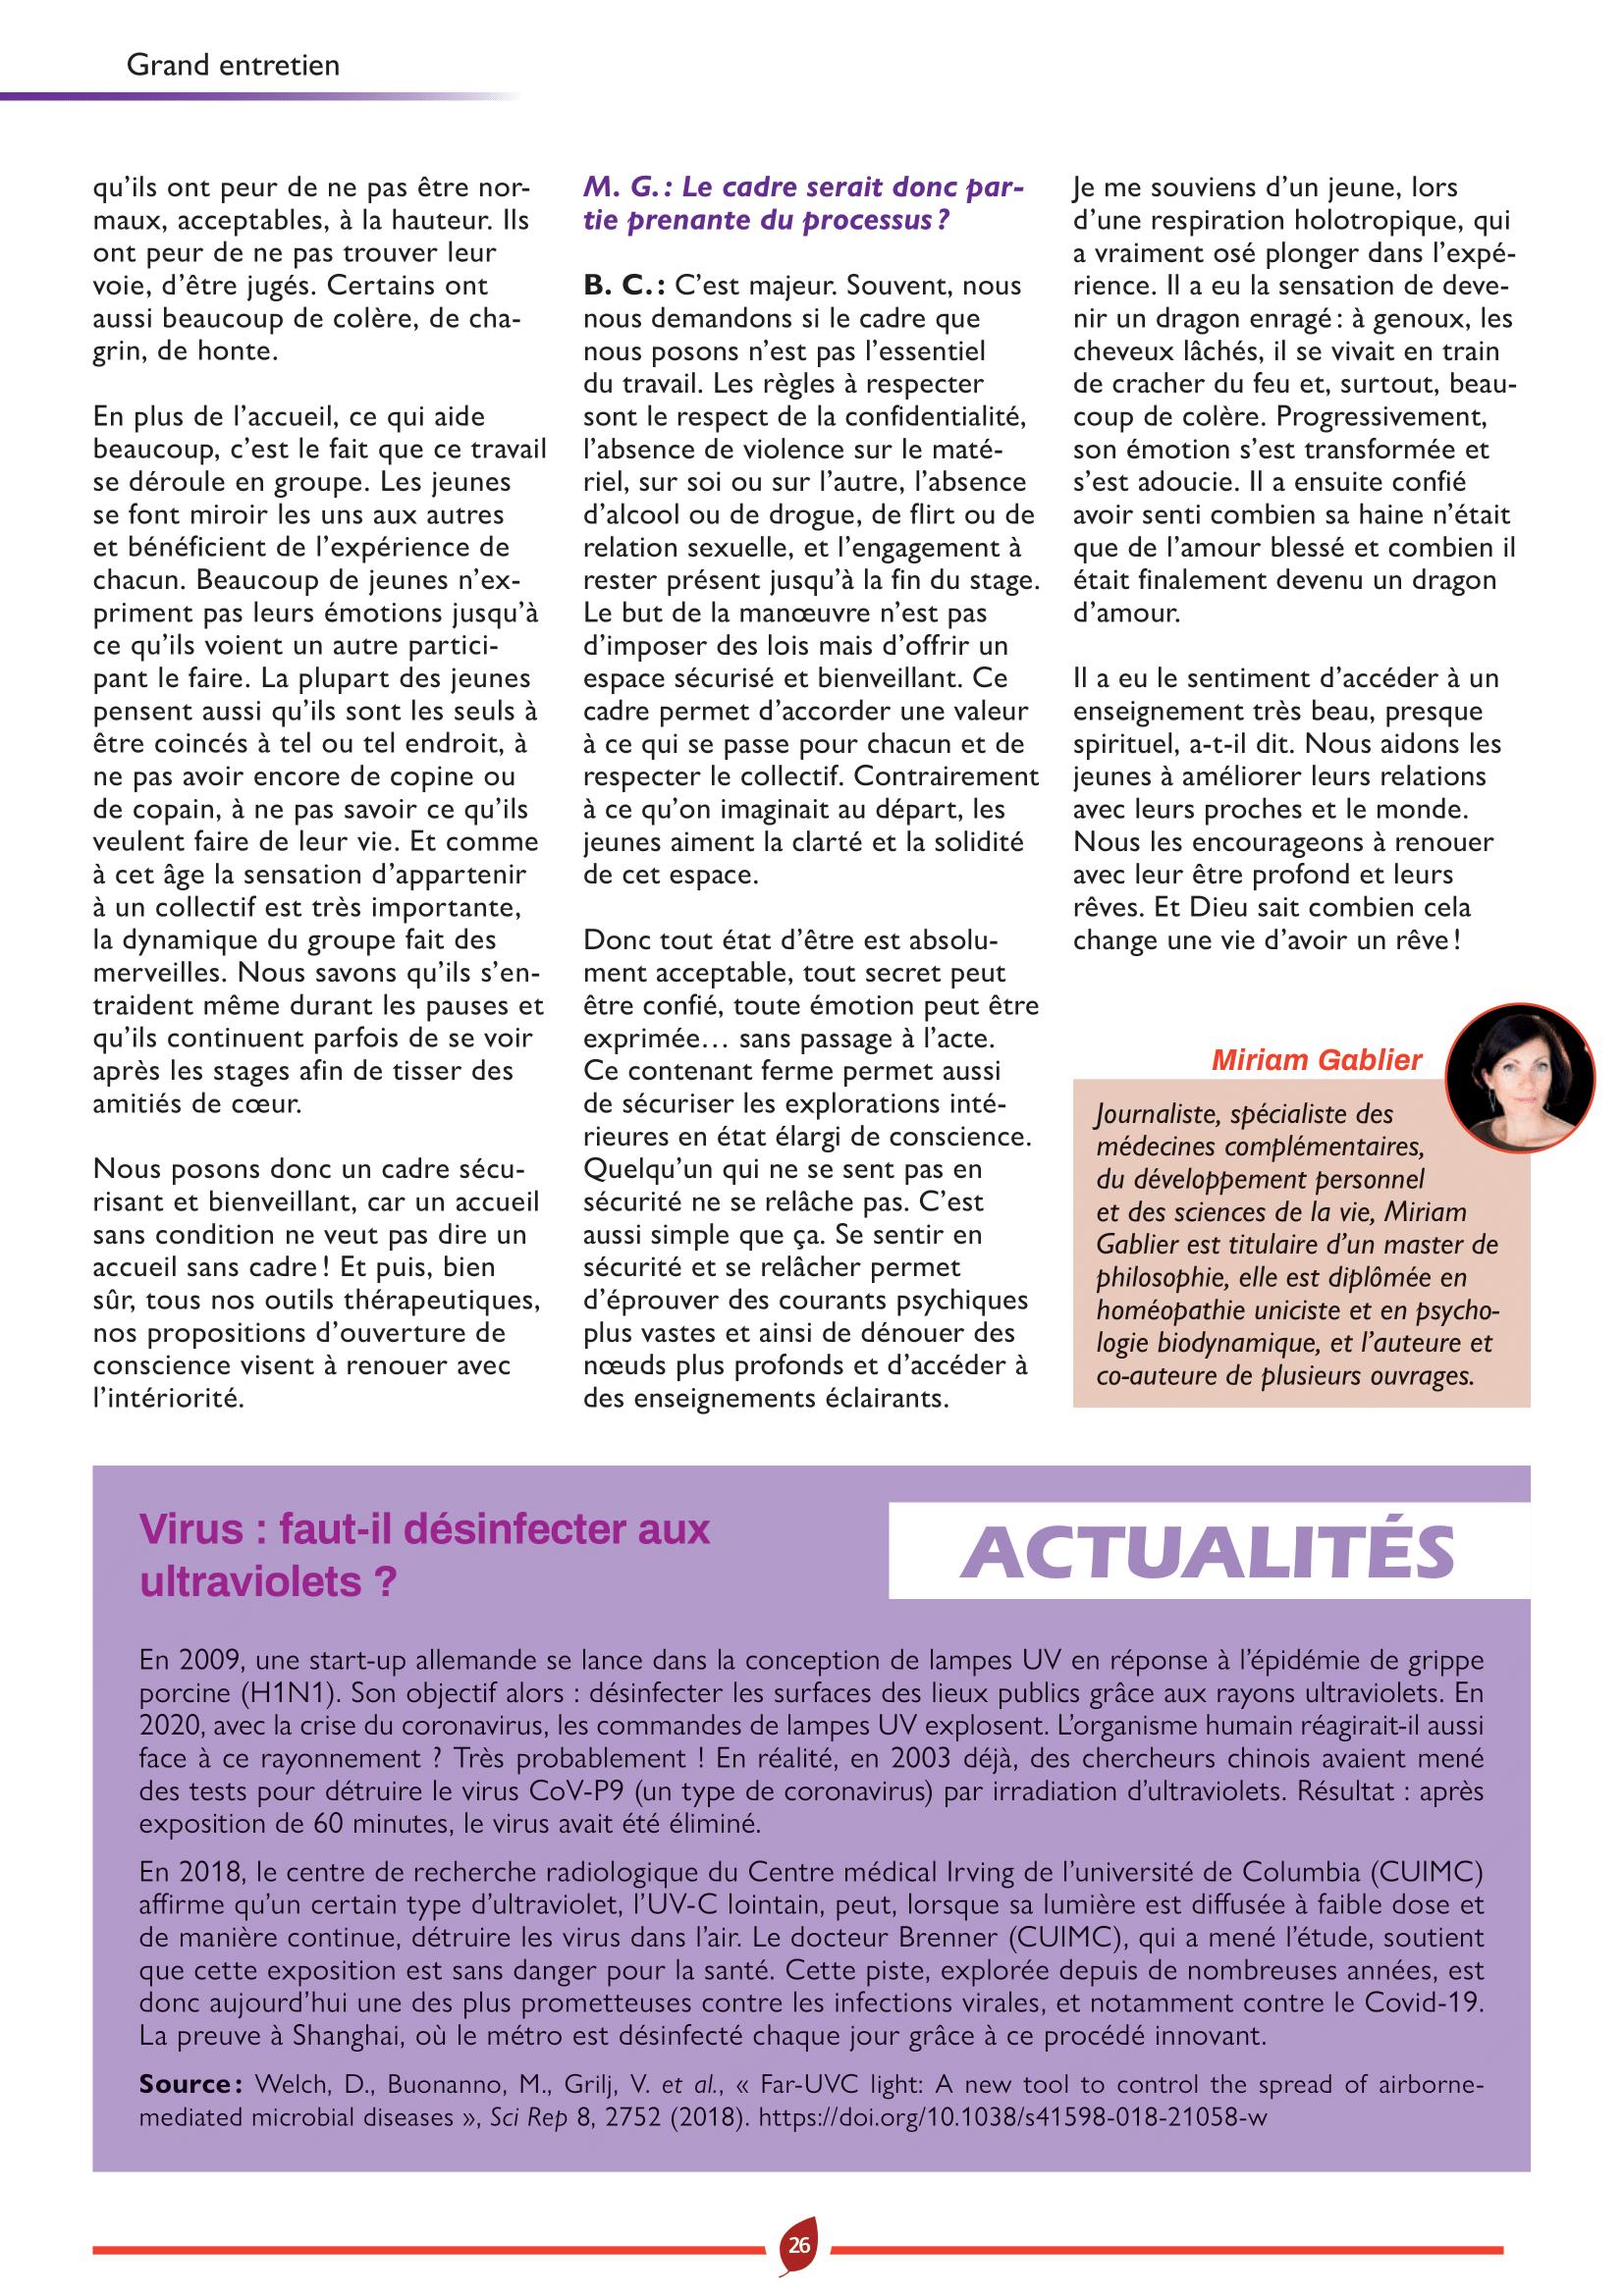 MEX28_ITW CHAVAS PAR GABLIER-4